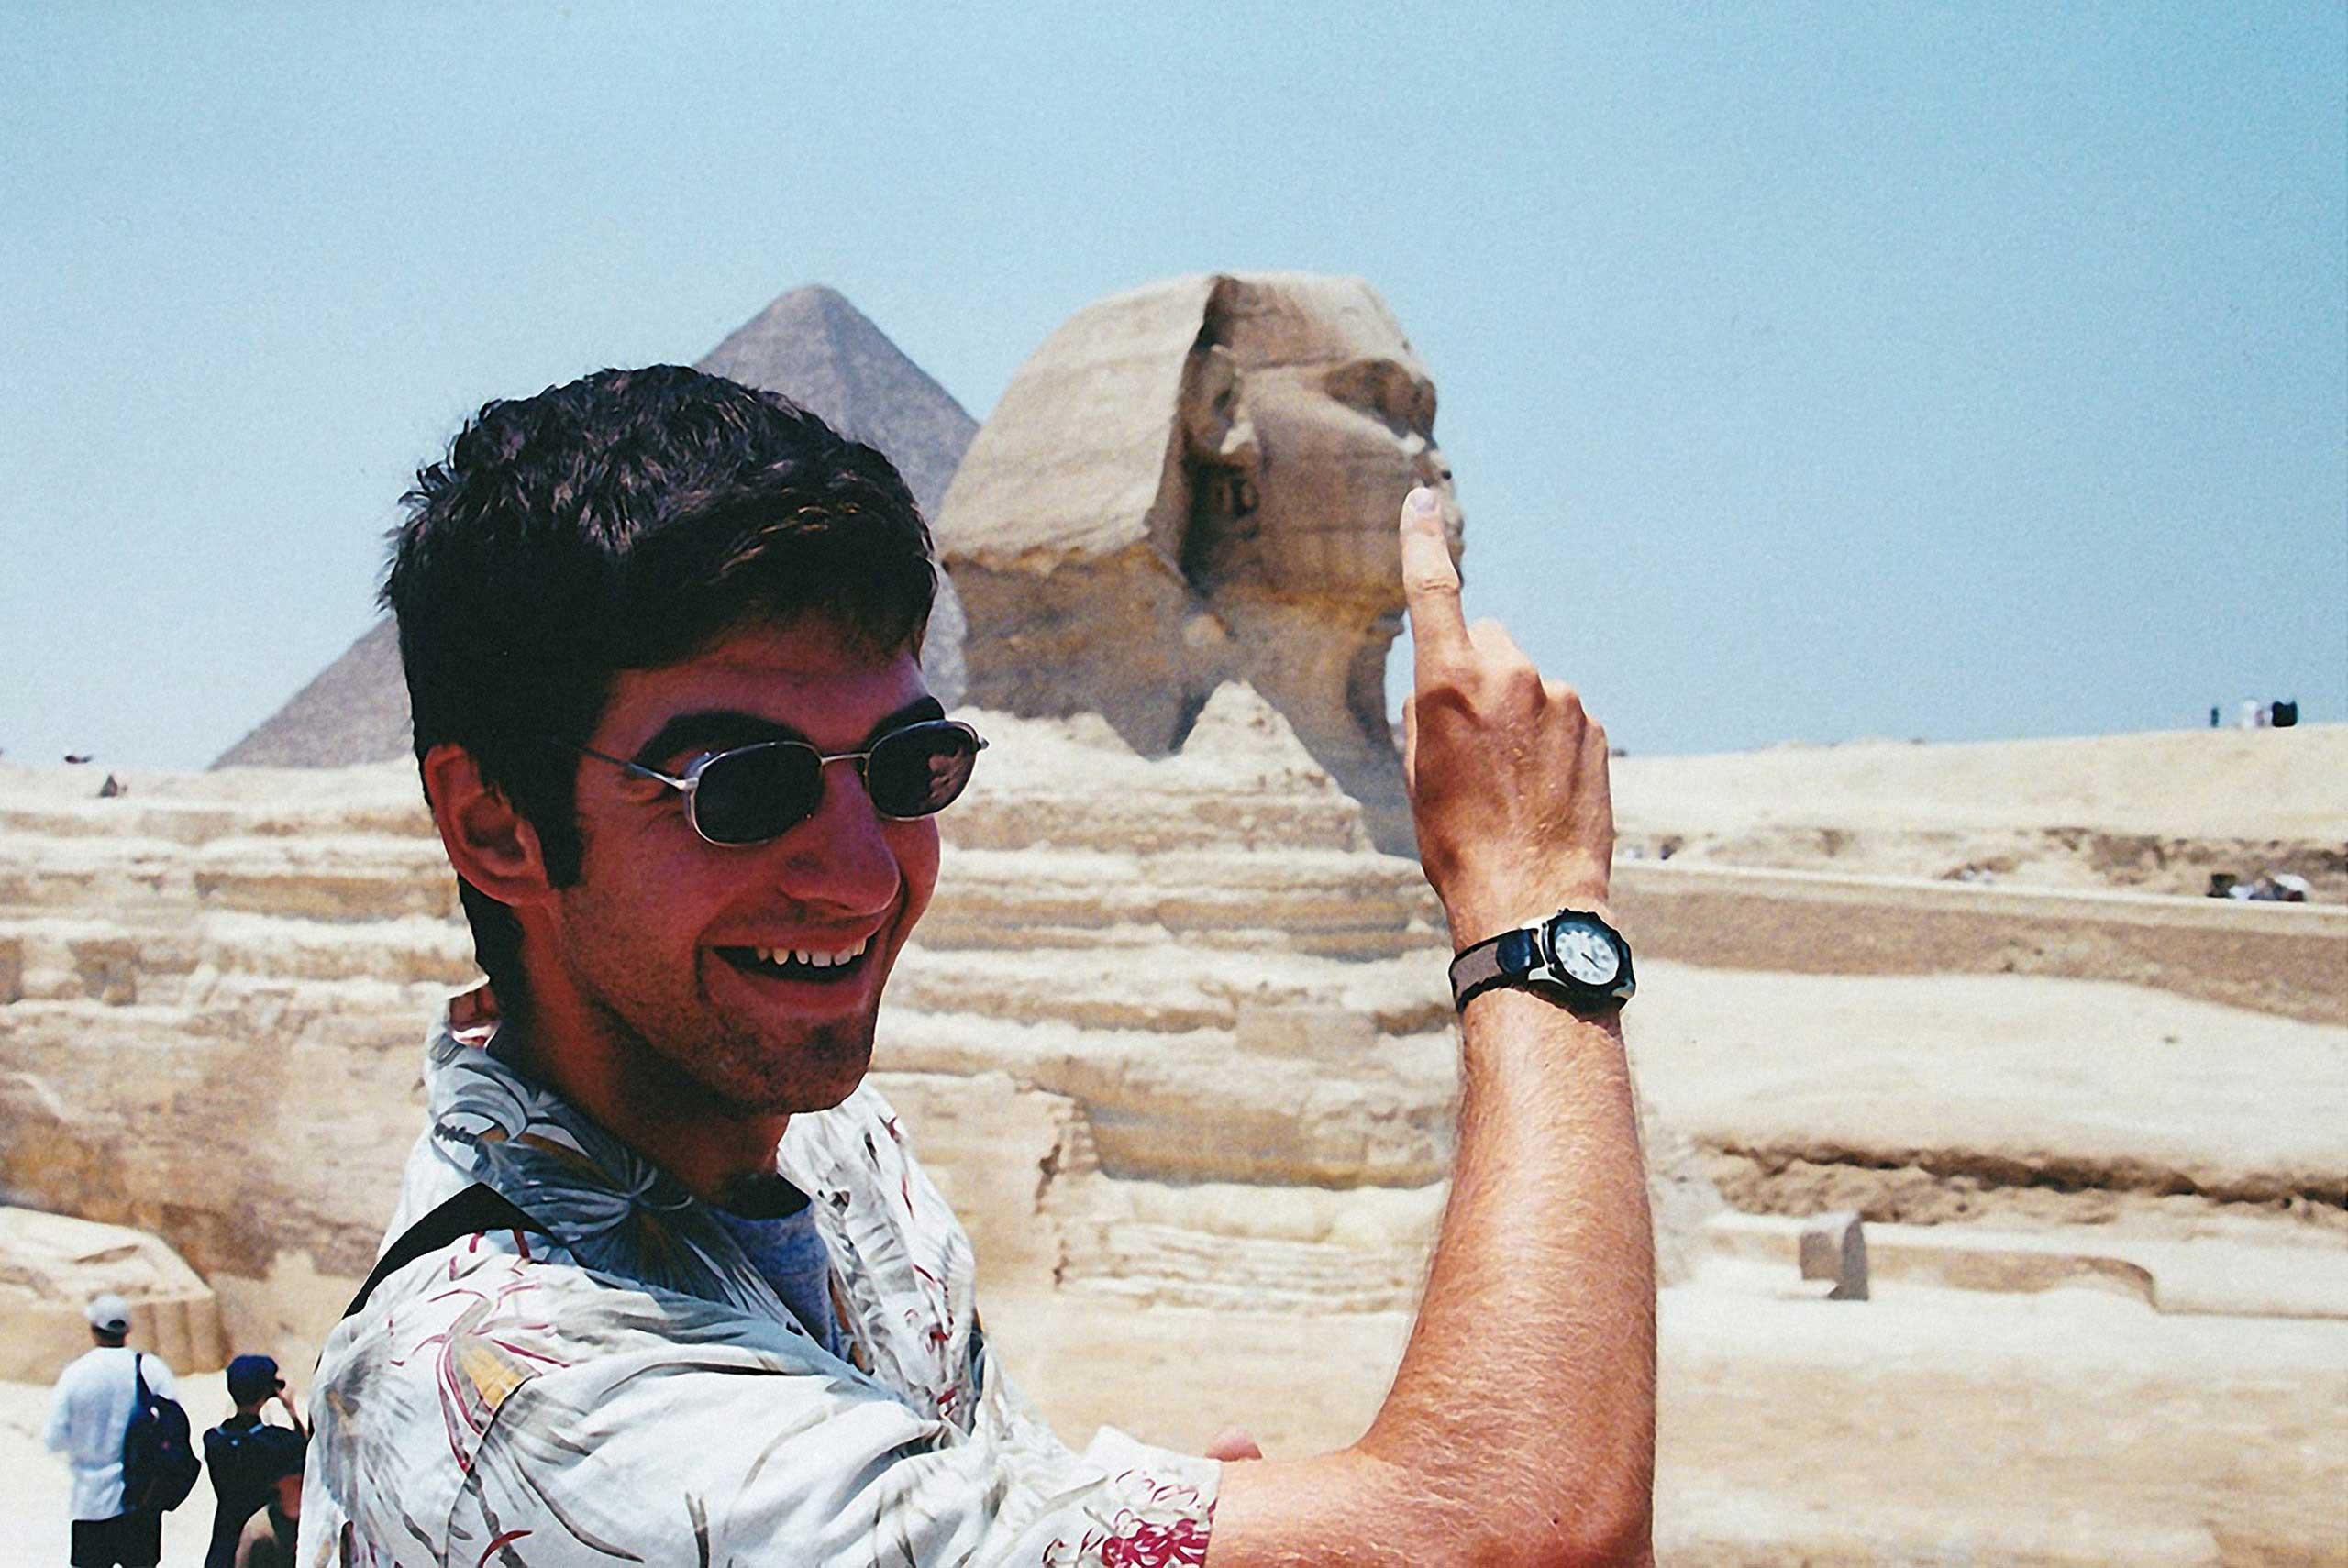 Kiss the Sphinx III. Cairo, Egypt, 2015.